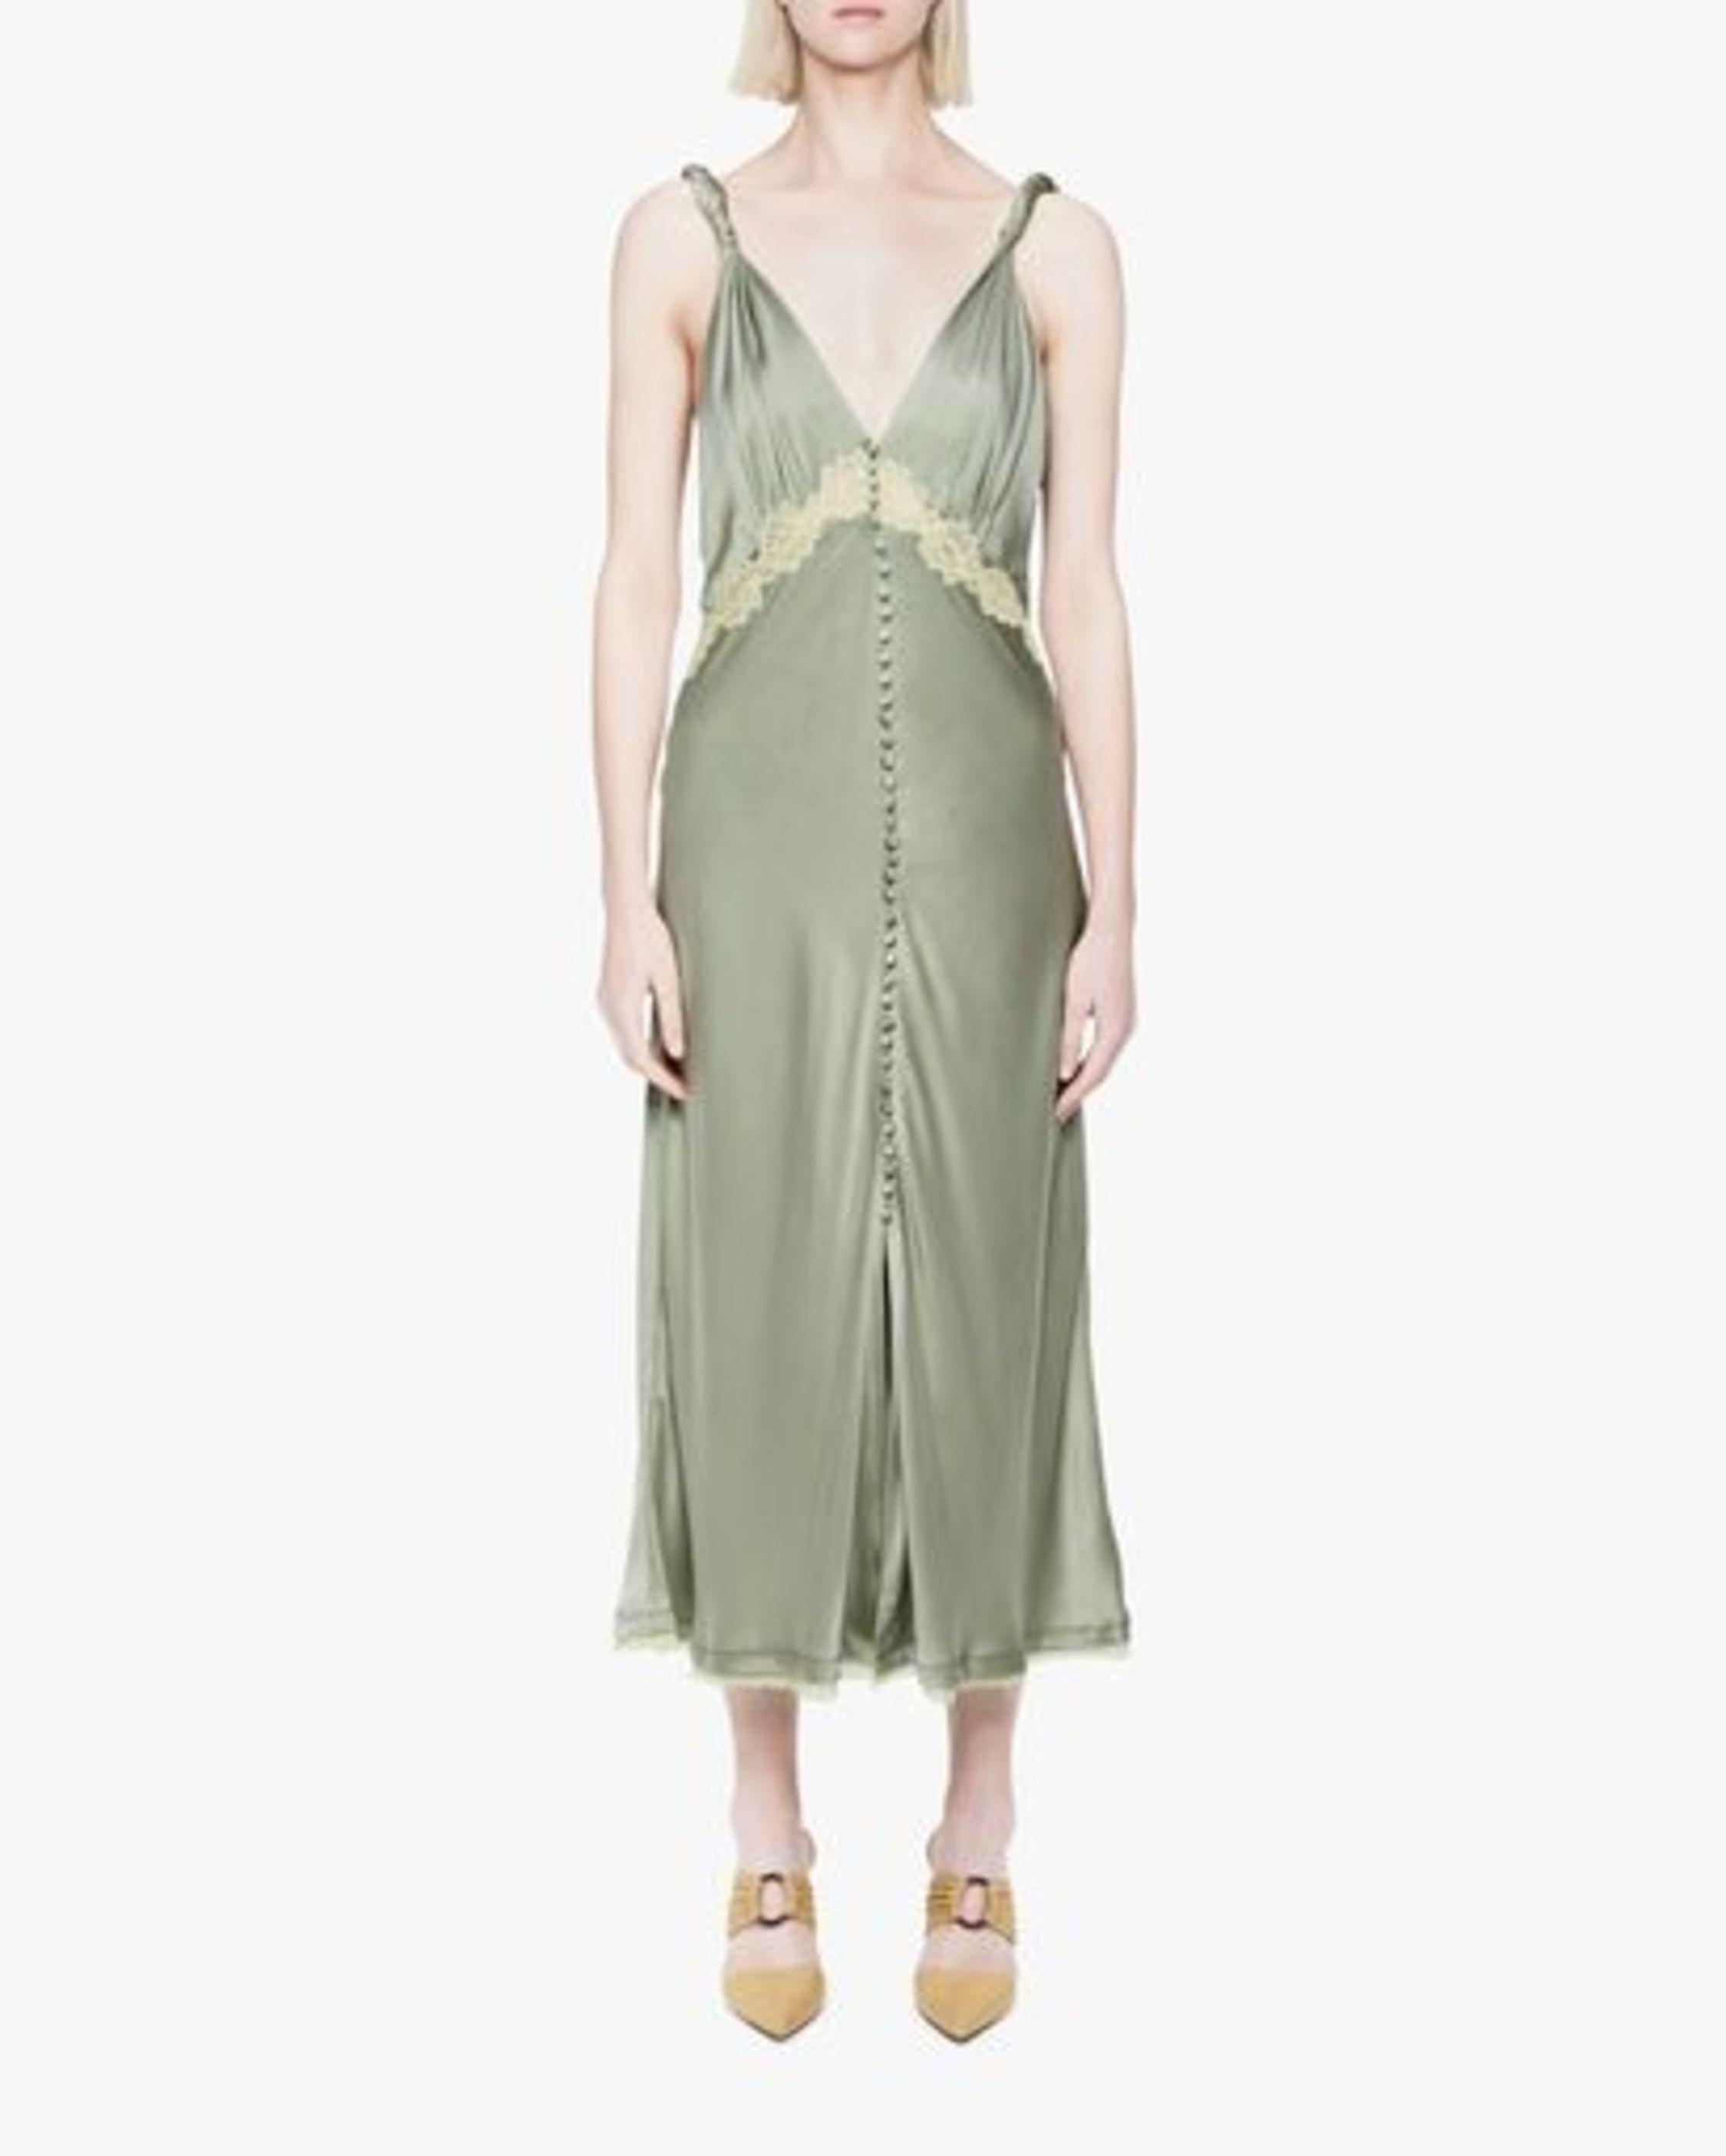 Jonathan Simkhai Kendra Sandwash Charmeuse Slip Dress 1